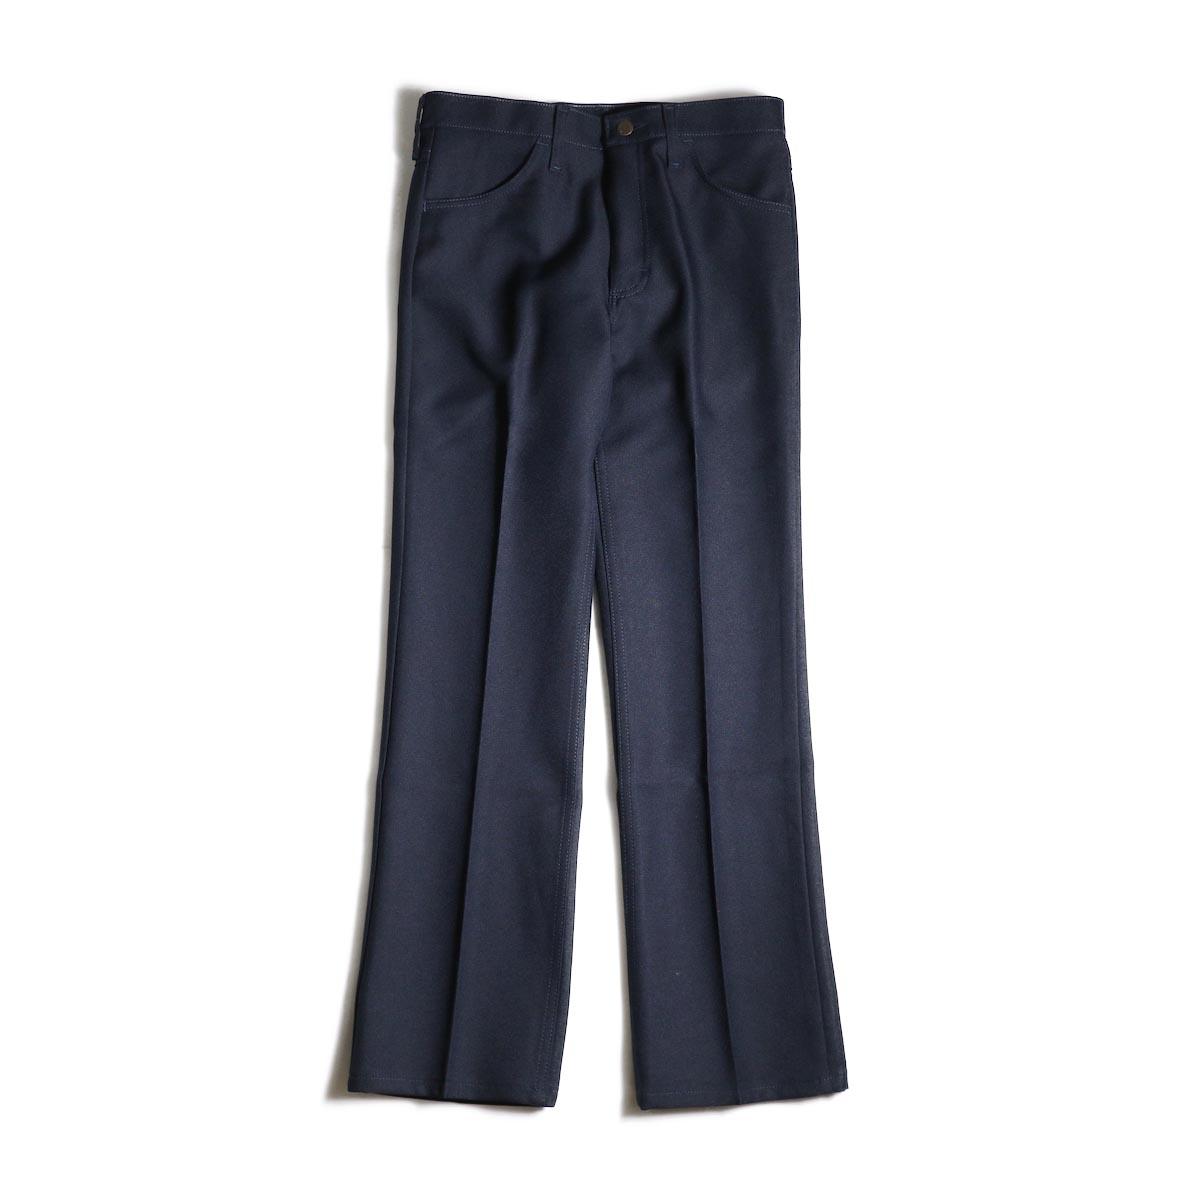 Wrangler / WRANCHER DRESS JEANS (Navy)正面